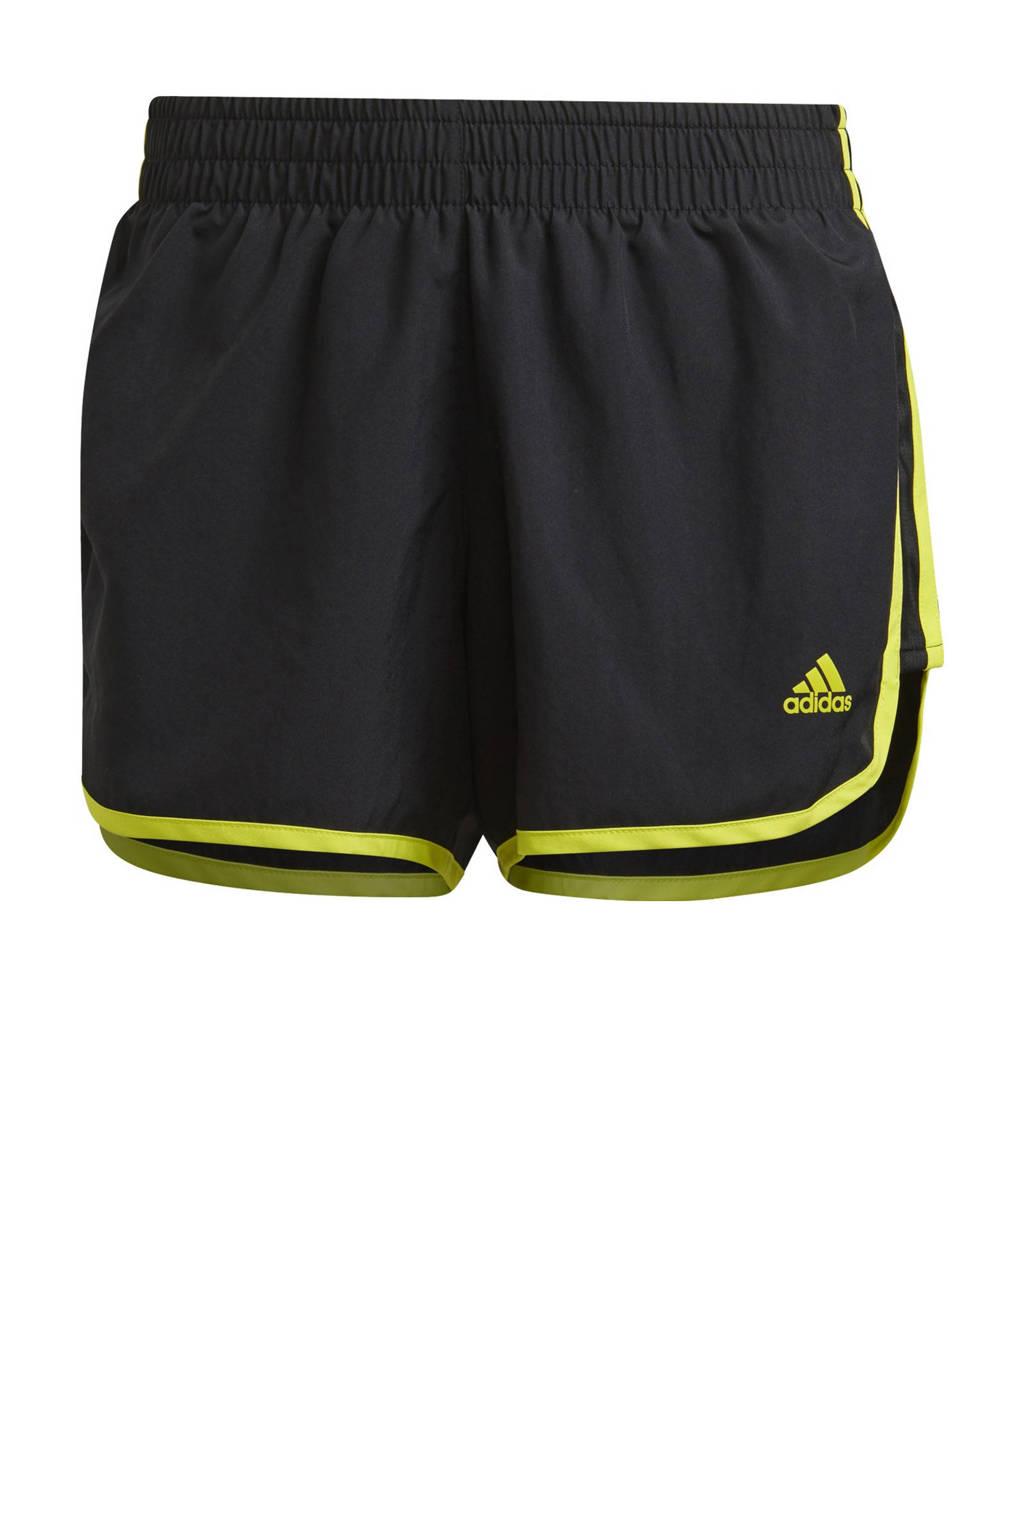 adidas Performance Marathon 20 hardloop short zwart/geel, Zwart/geel